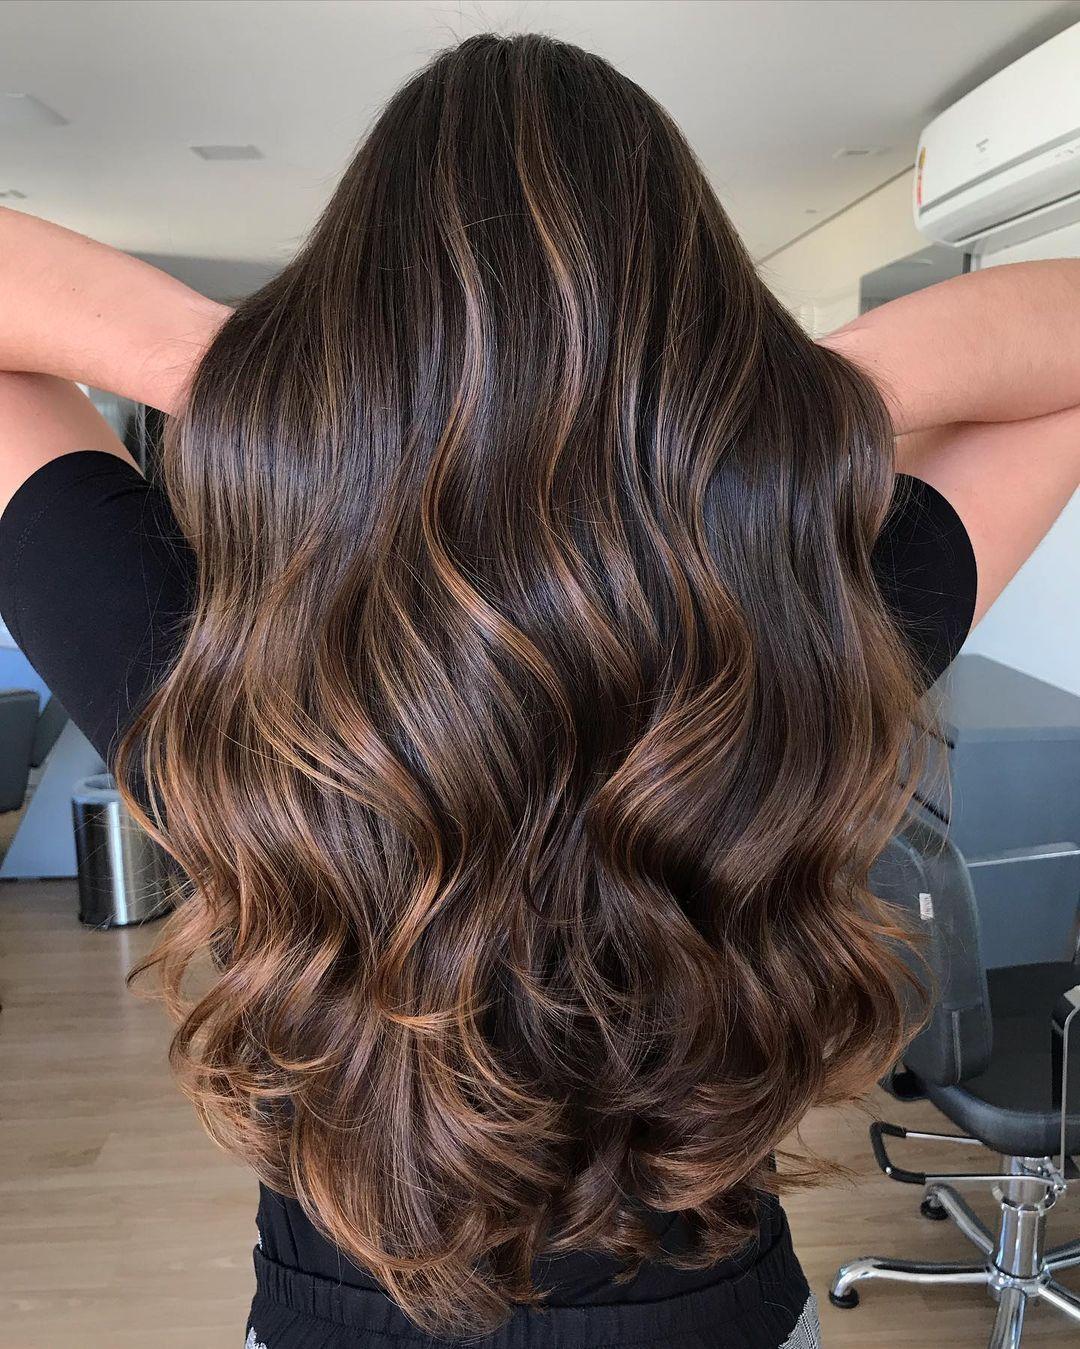 Partial Sun-Kissed Balayage Hair